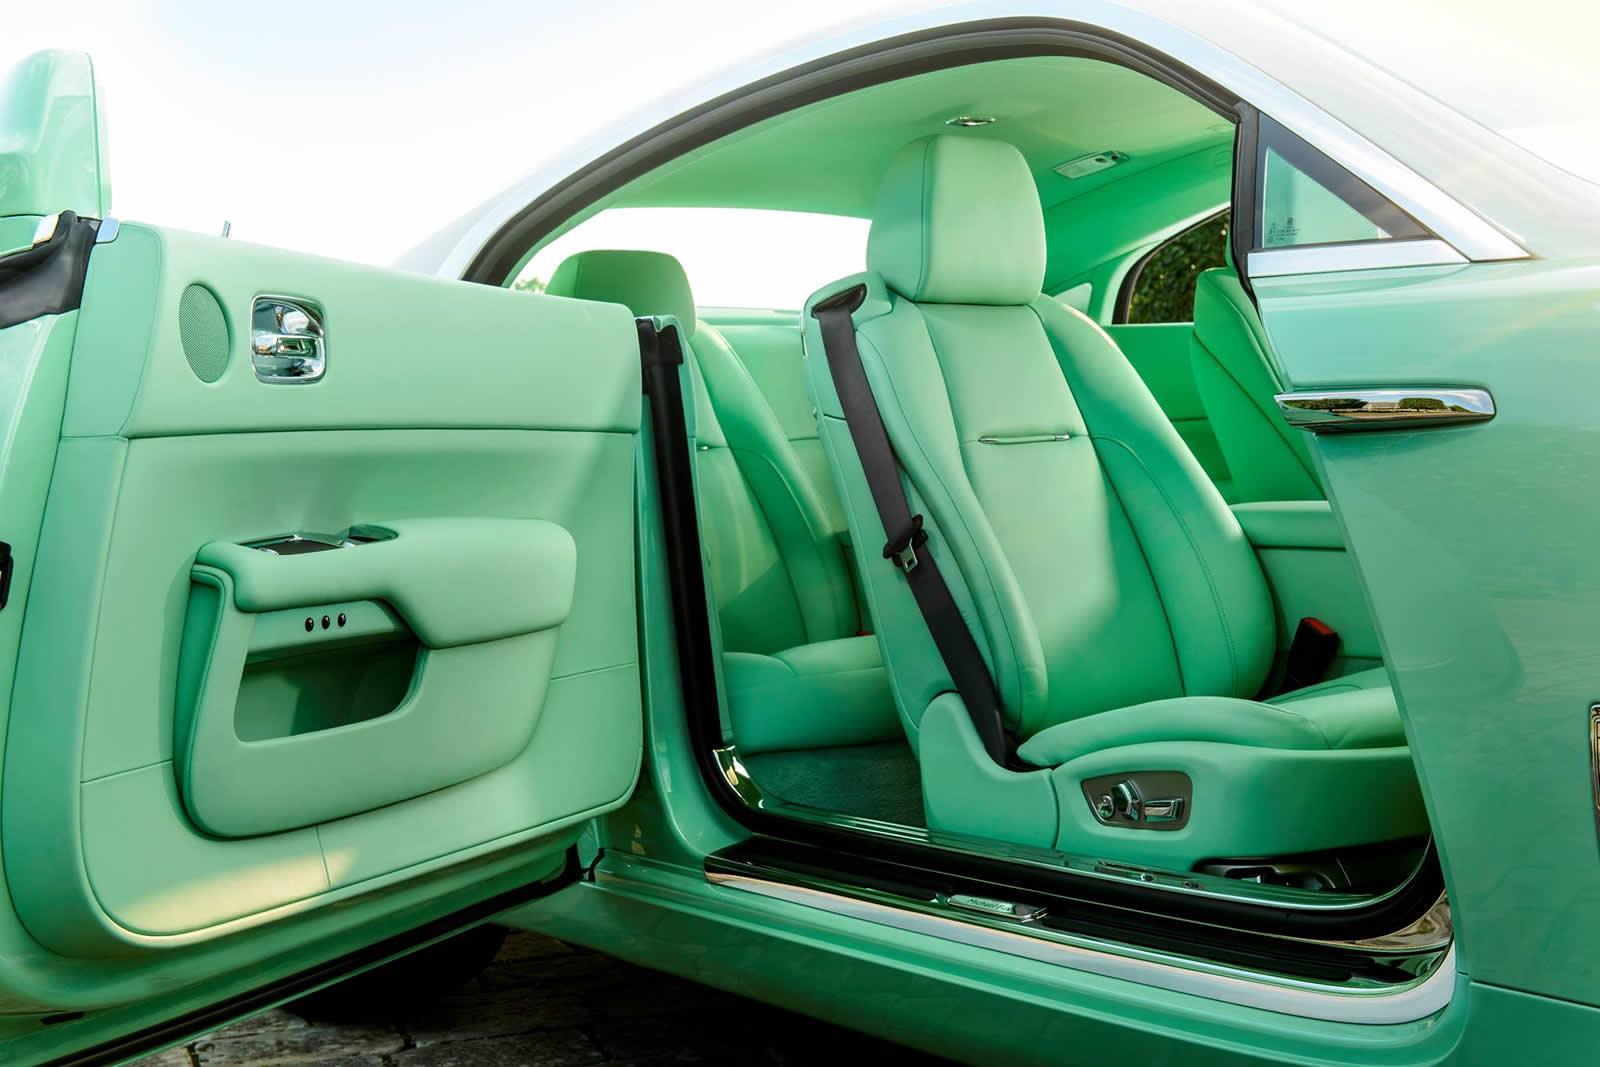 A Green Rolls Royce Wraith